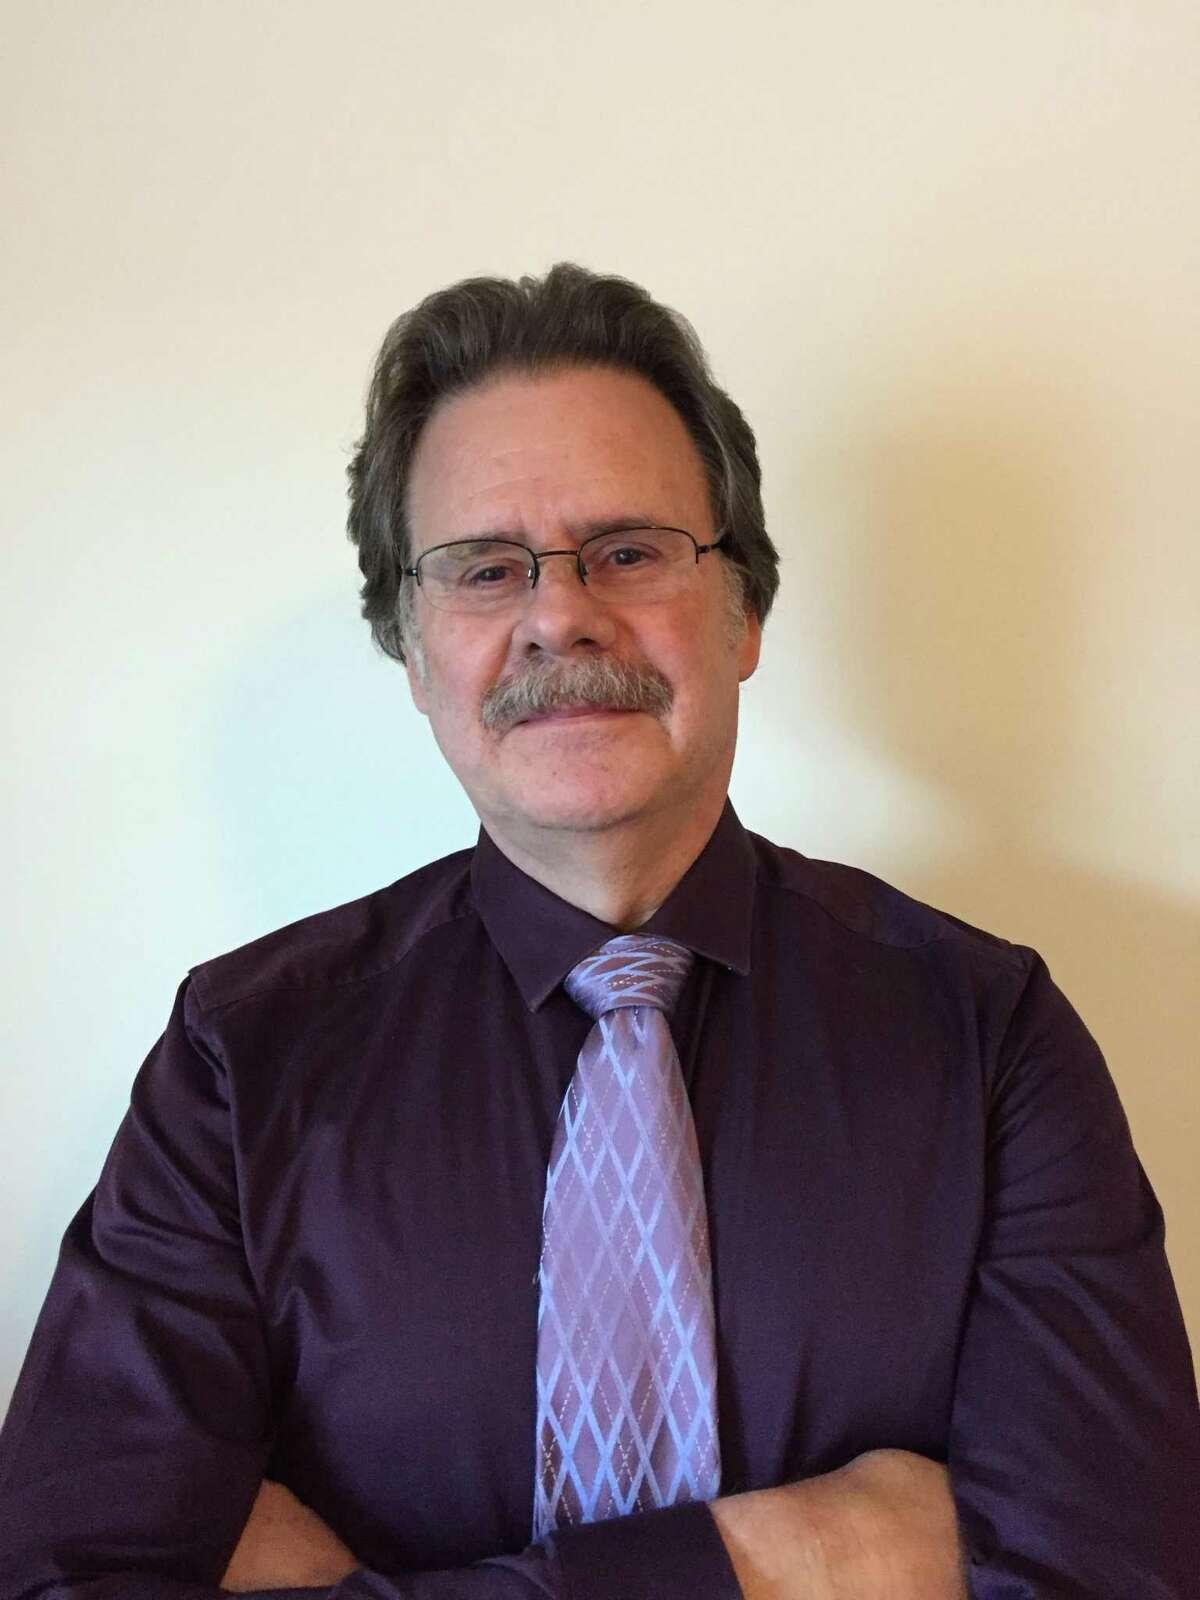 Michael Limoli, author of